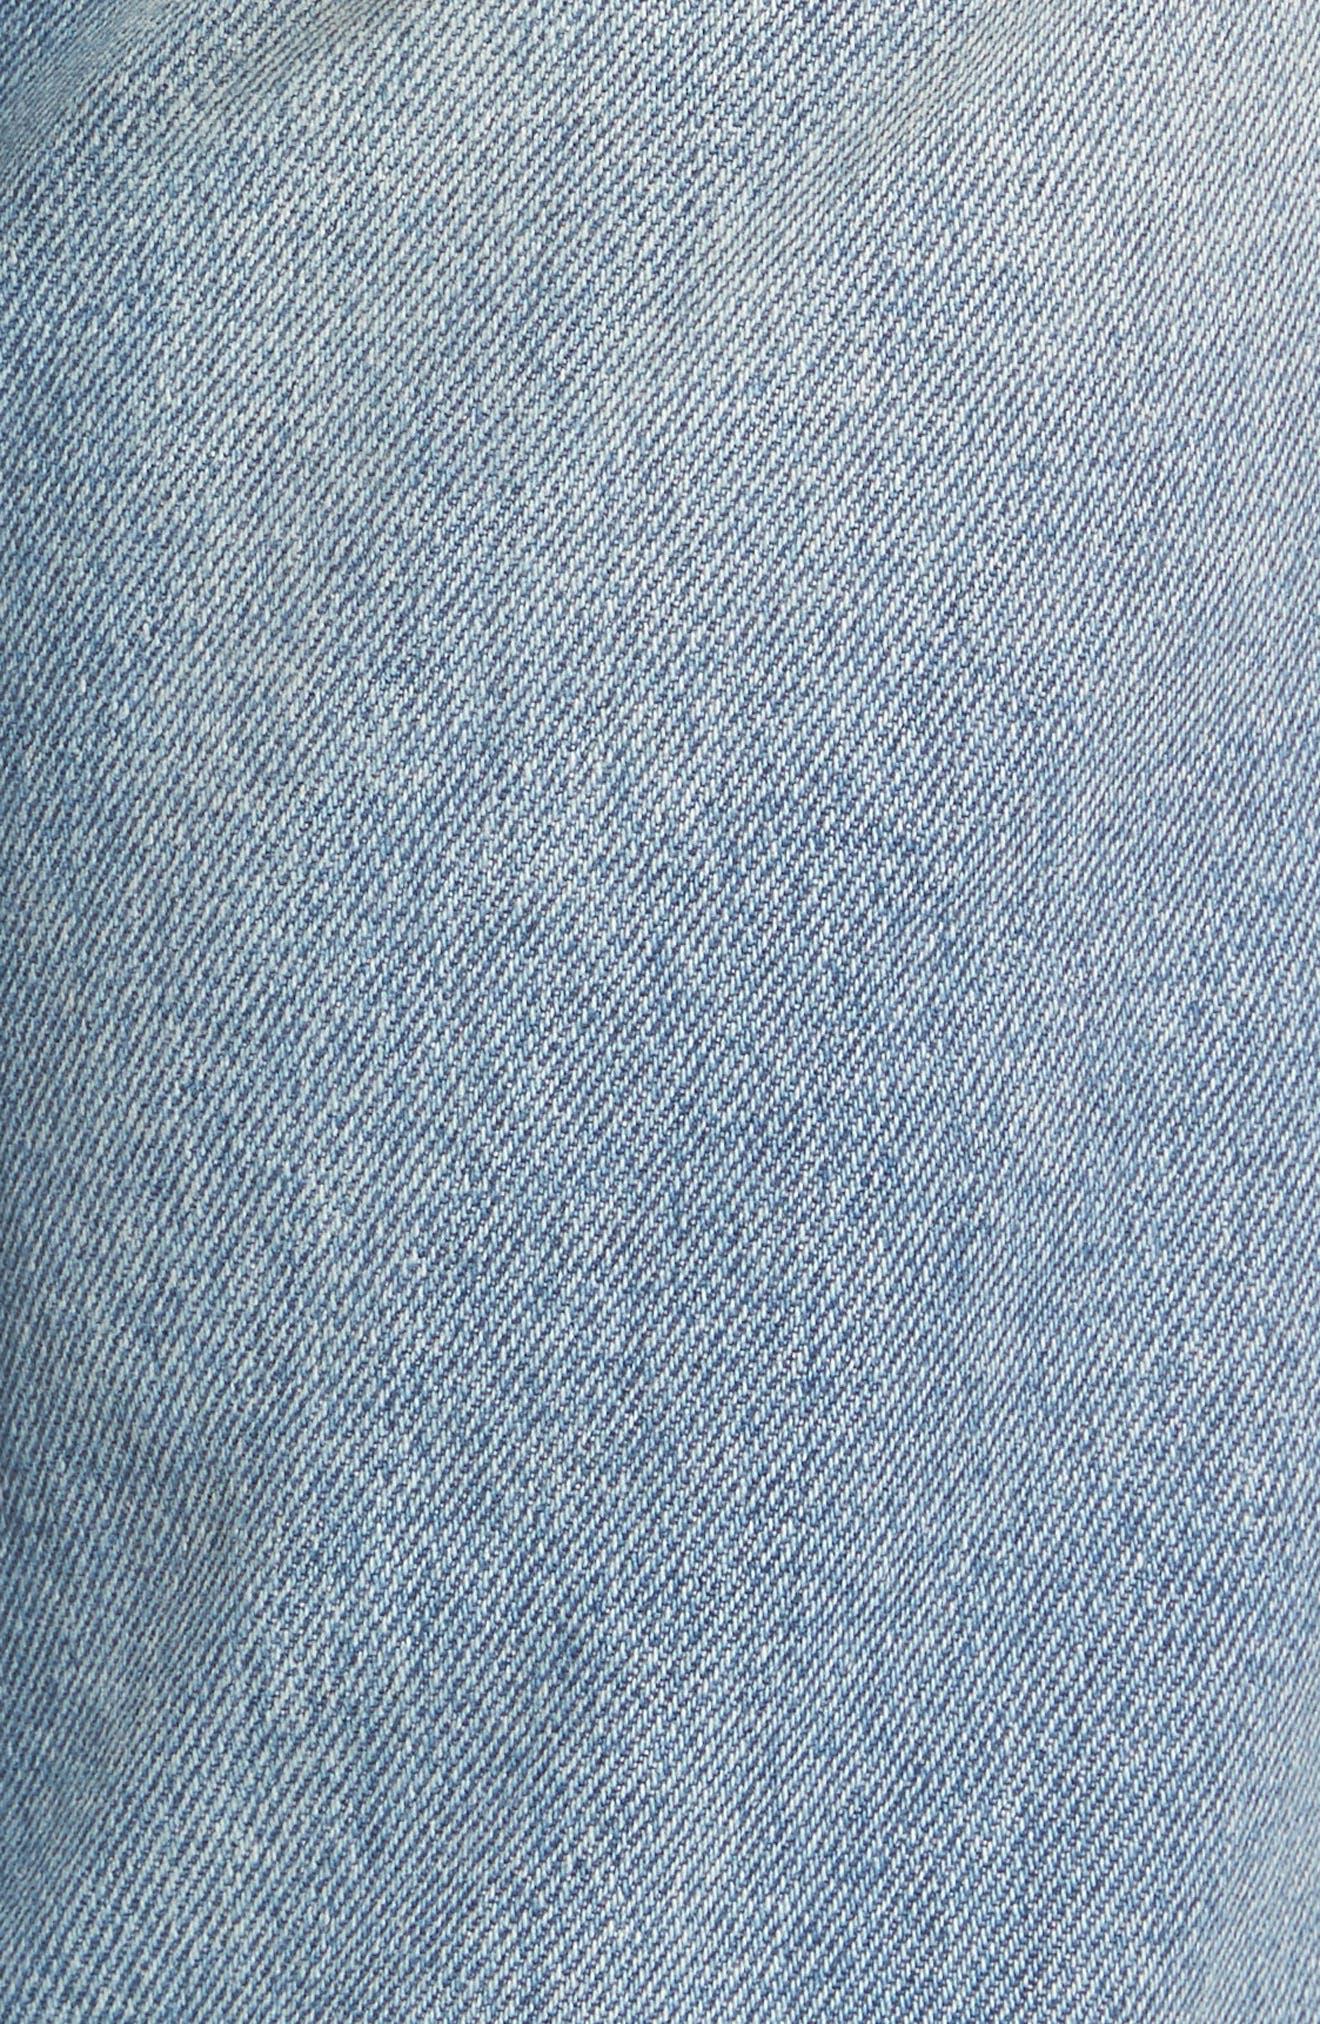 Sundays Straggler High Waist Jeans,                             Alternate thumbnail 5, color,                             Bleached Indigo